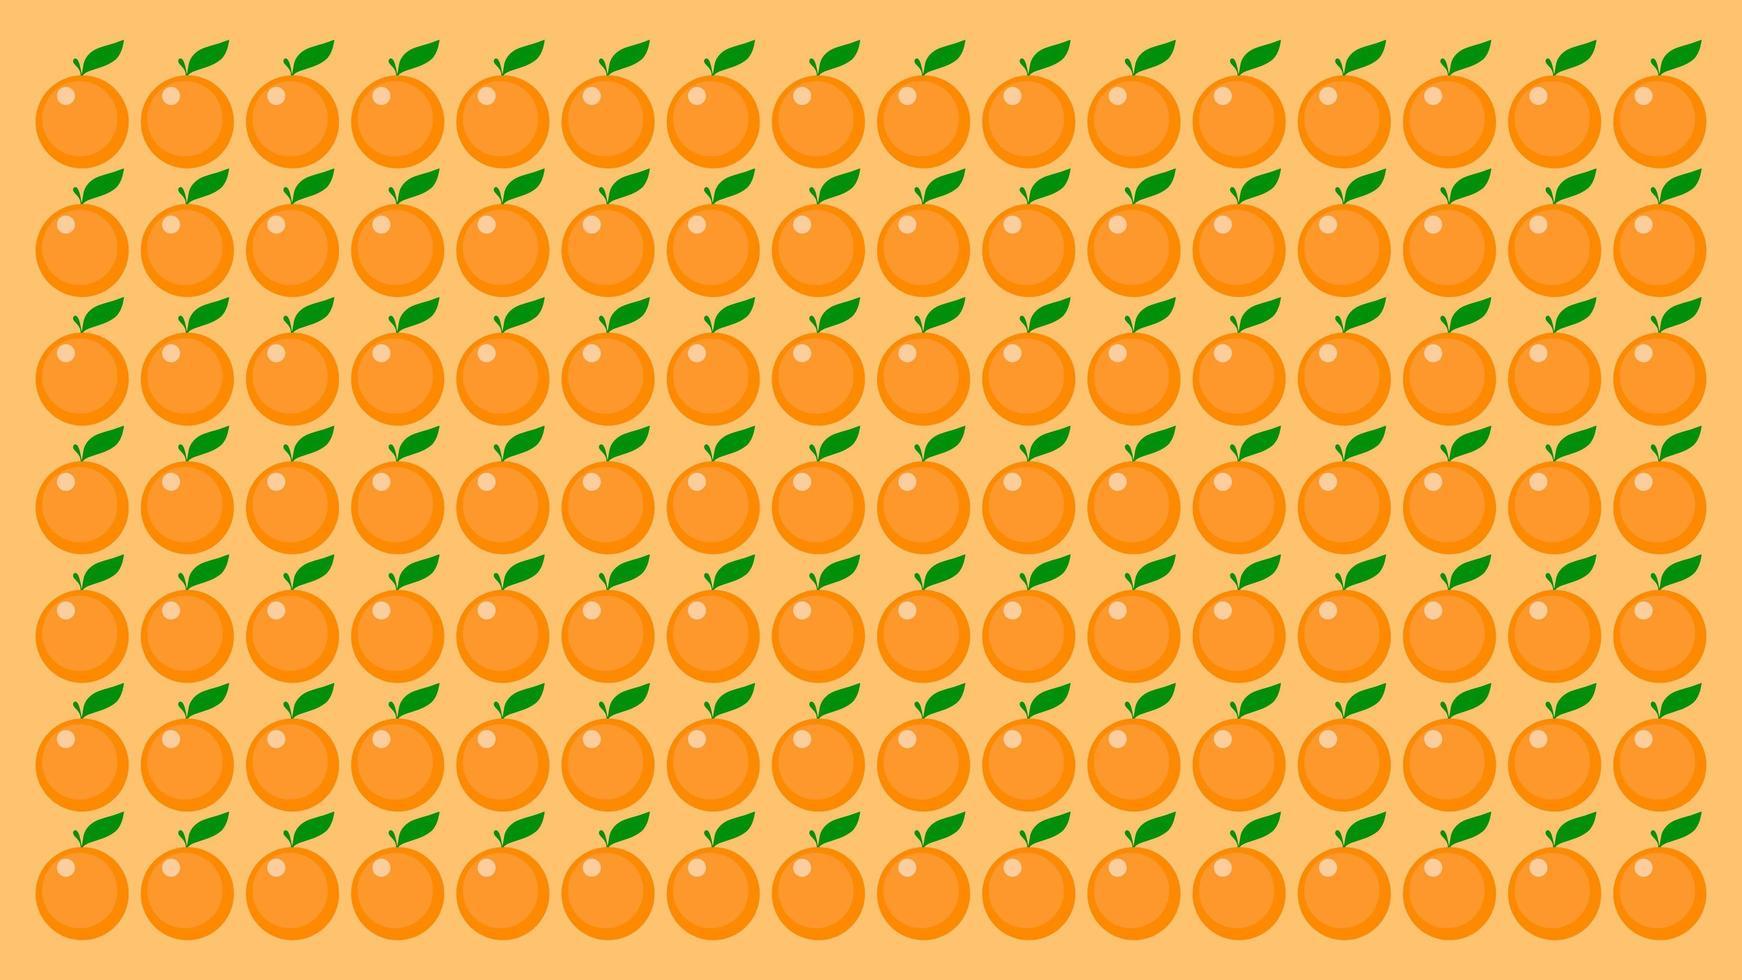 patrón de fondo naranja vector